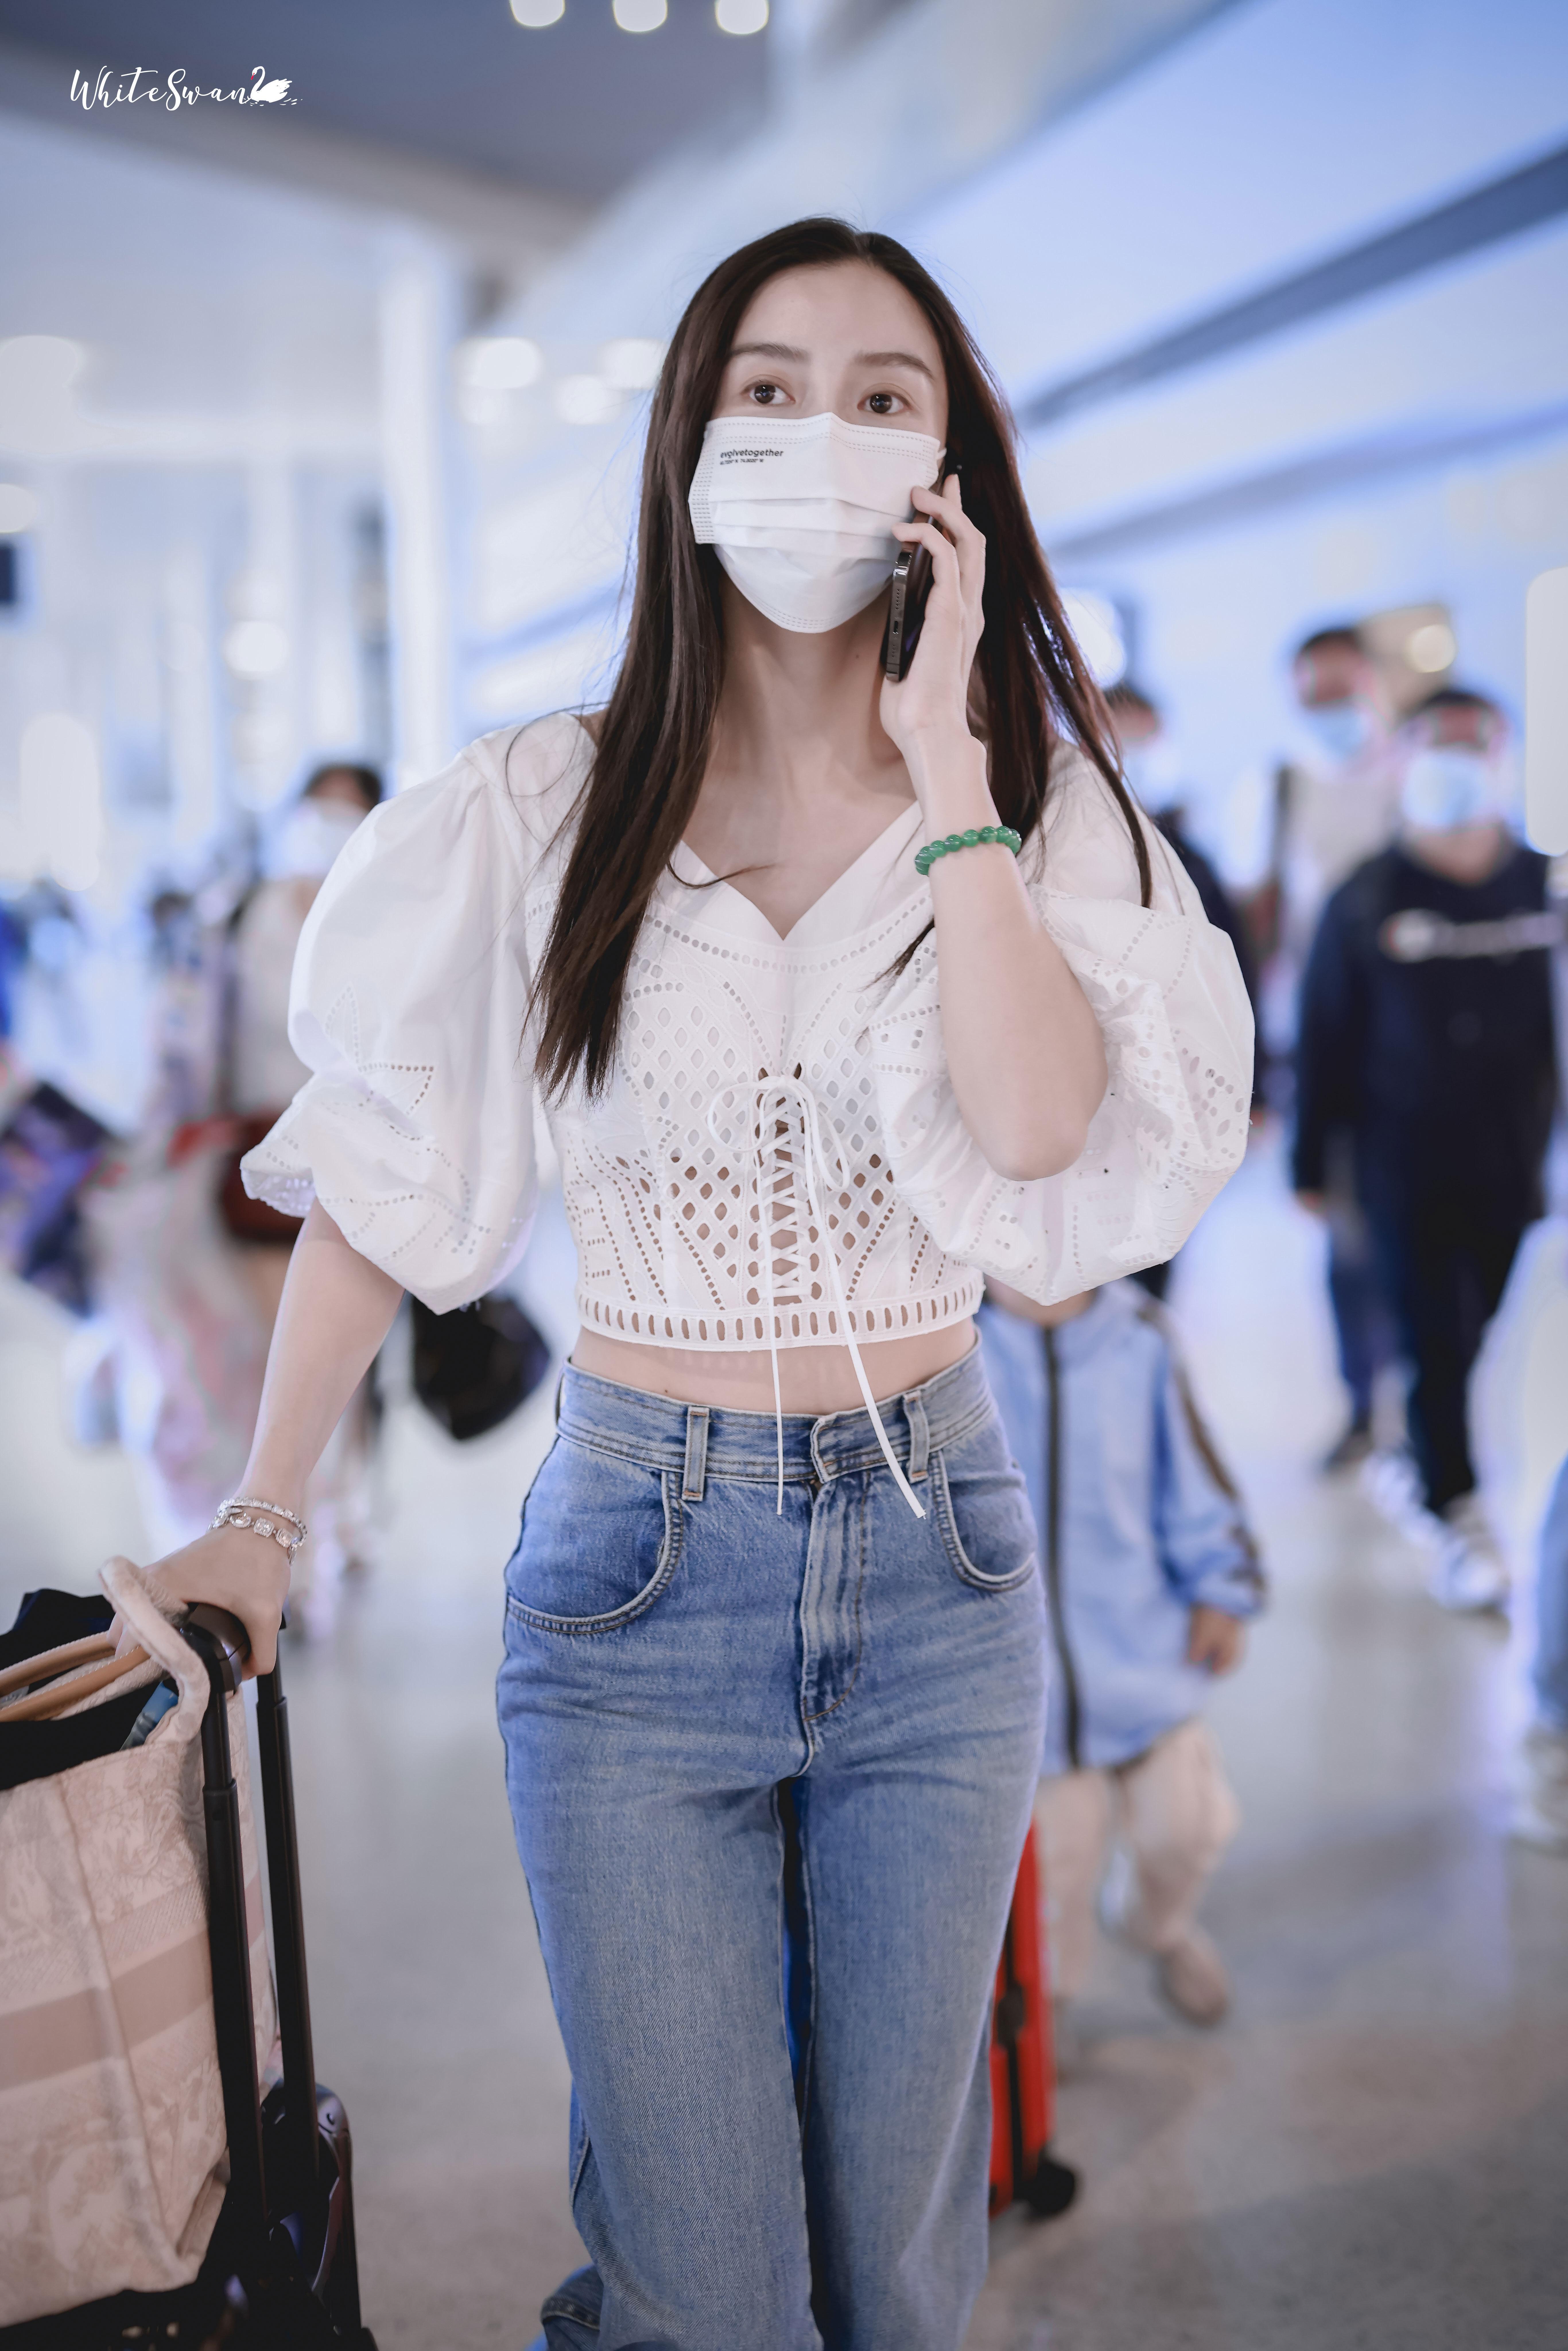 Angelababy穿白衬衫秀纤腰 马甲线隐约可见身材管理绝,